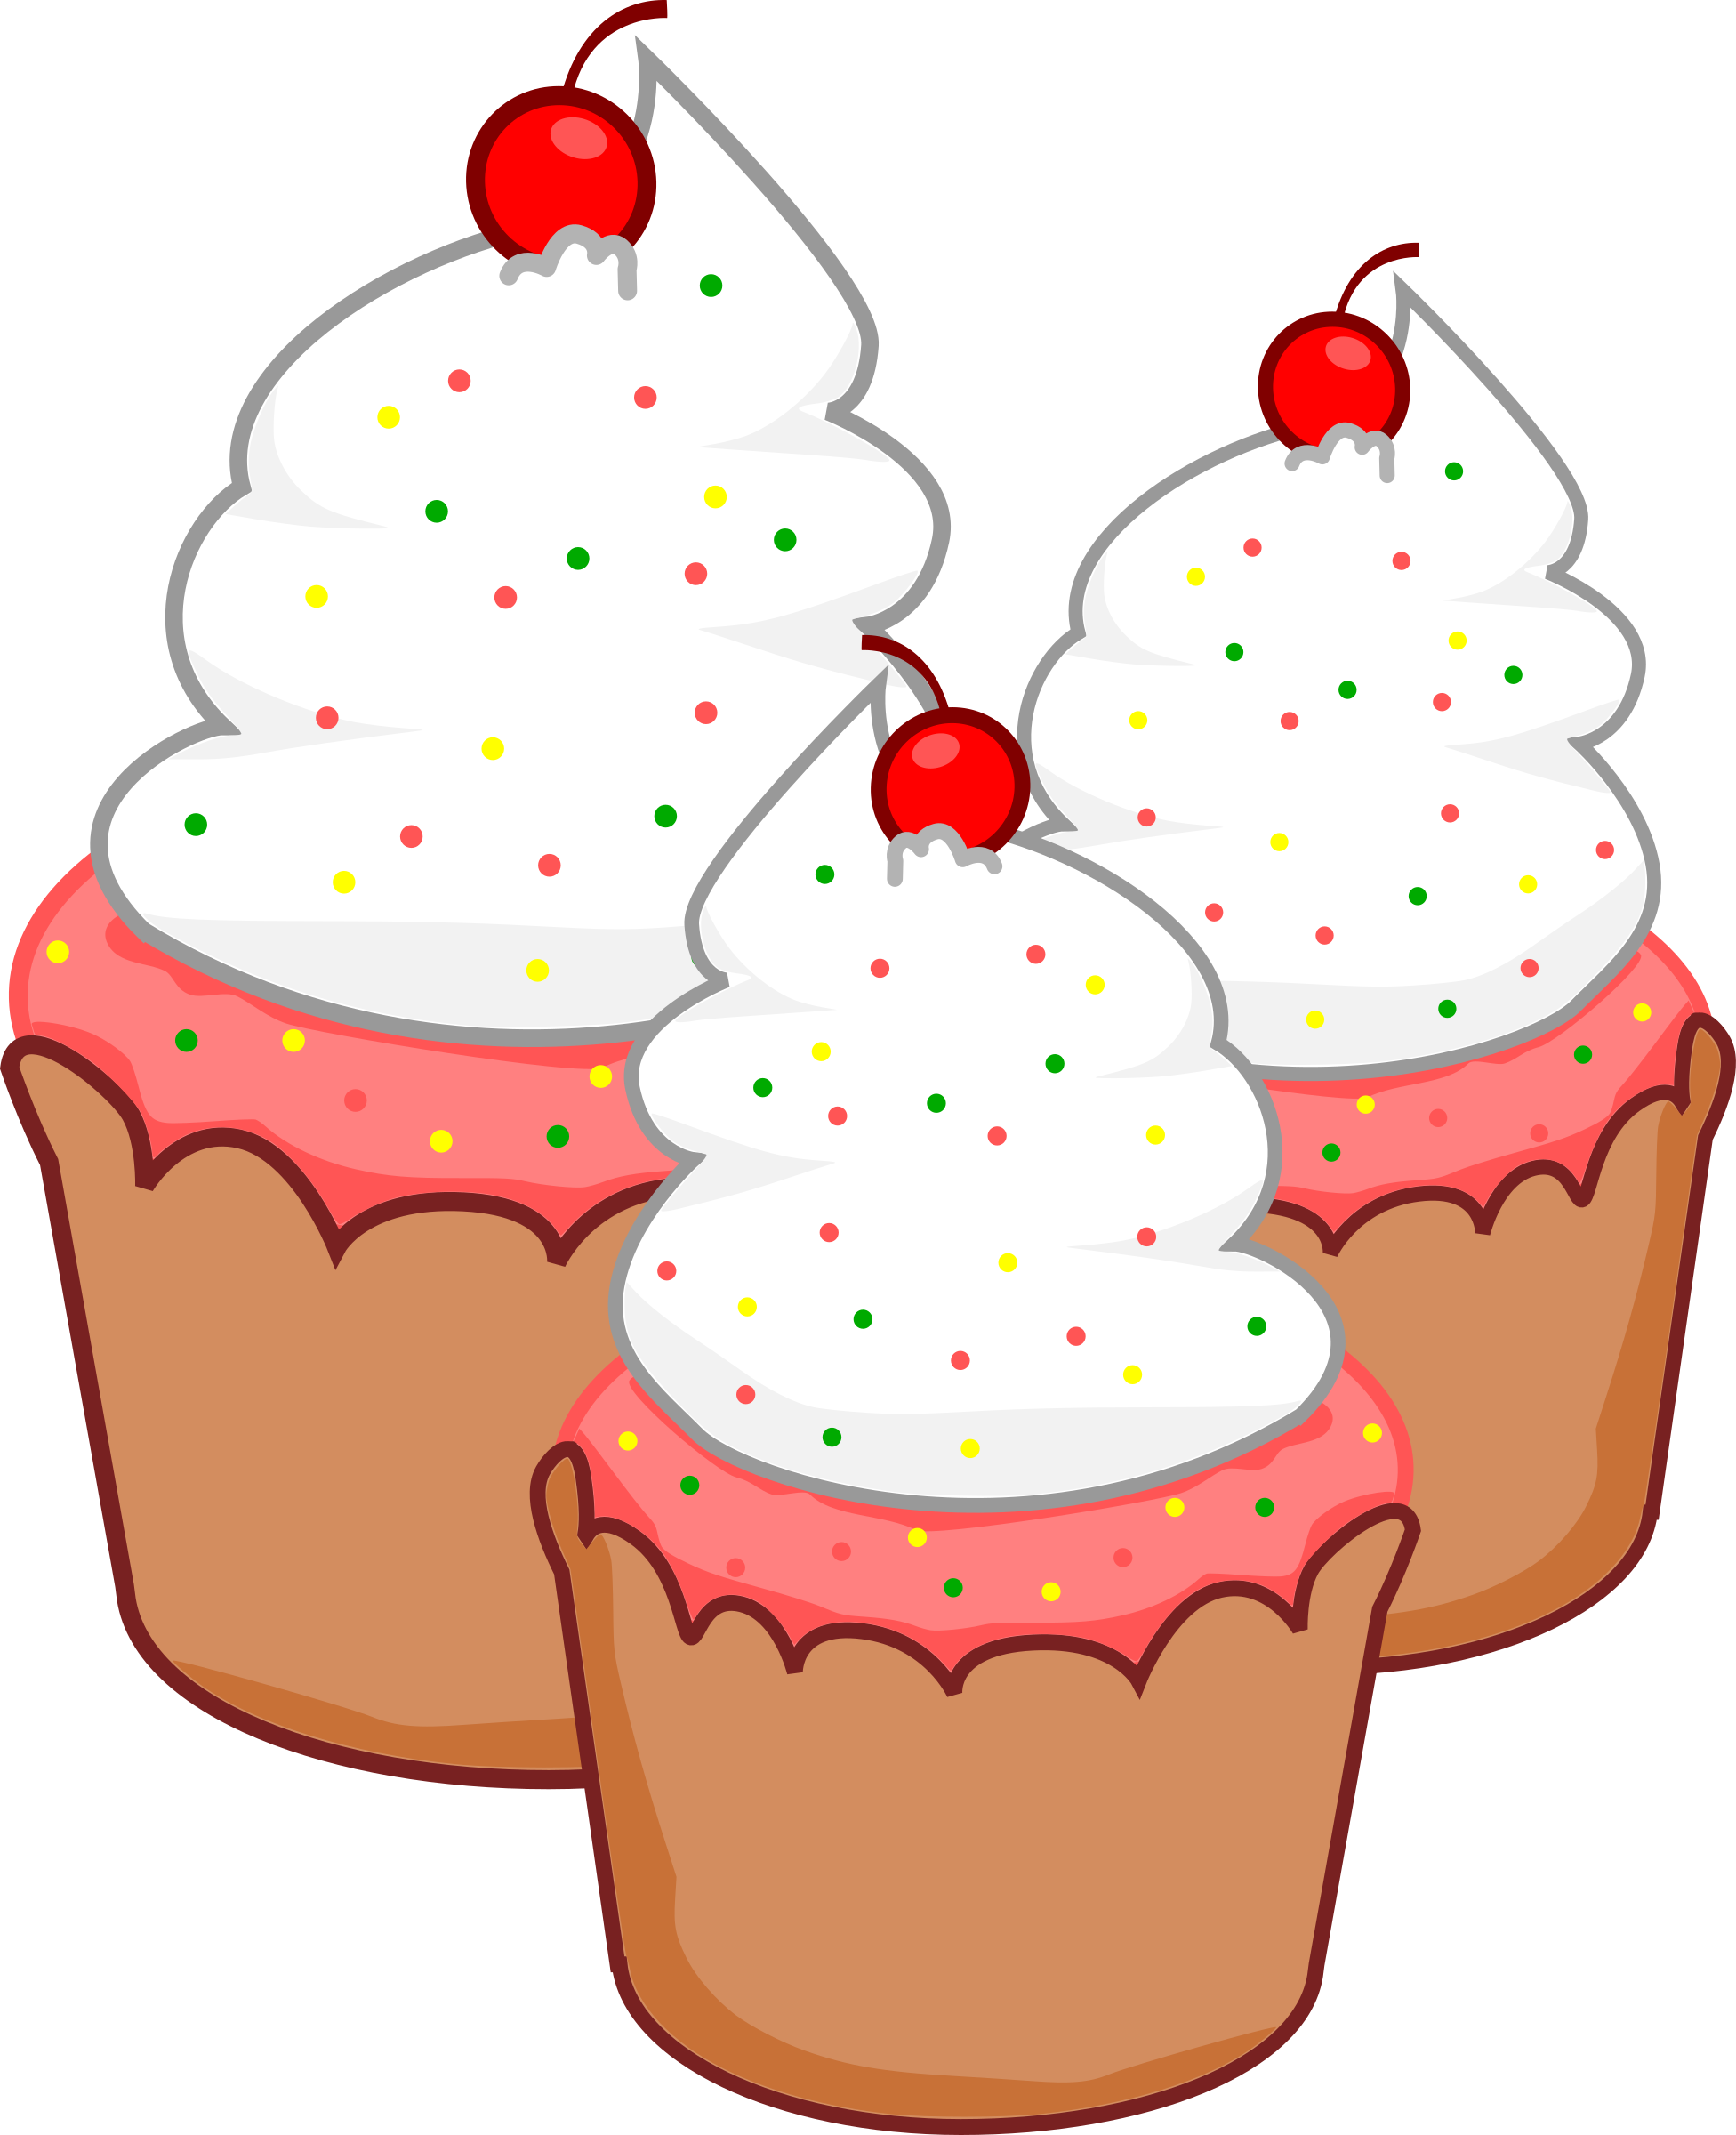 Desserts clipart cupcake. Cupcakes big image png